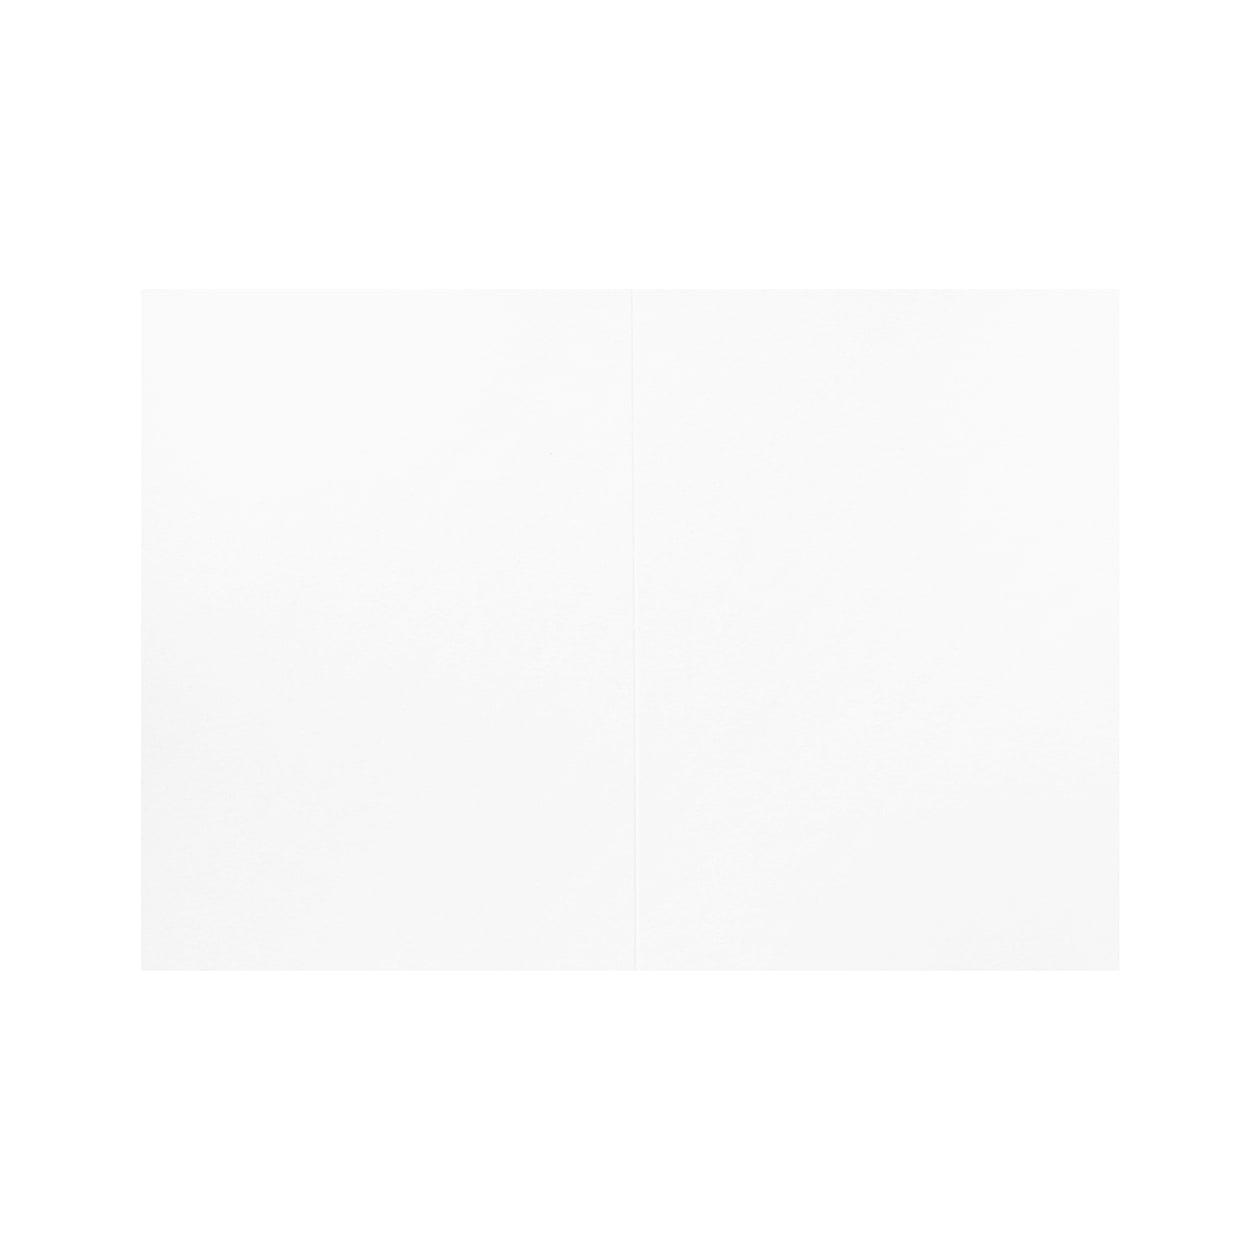 A4カバー コットン スノーホワイト 348.8g